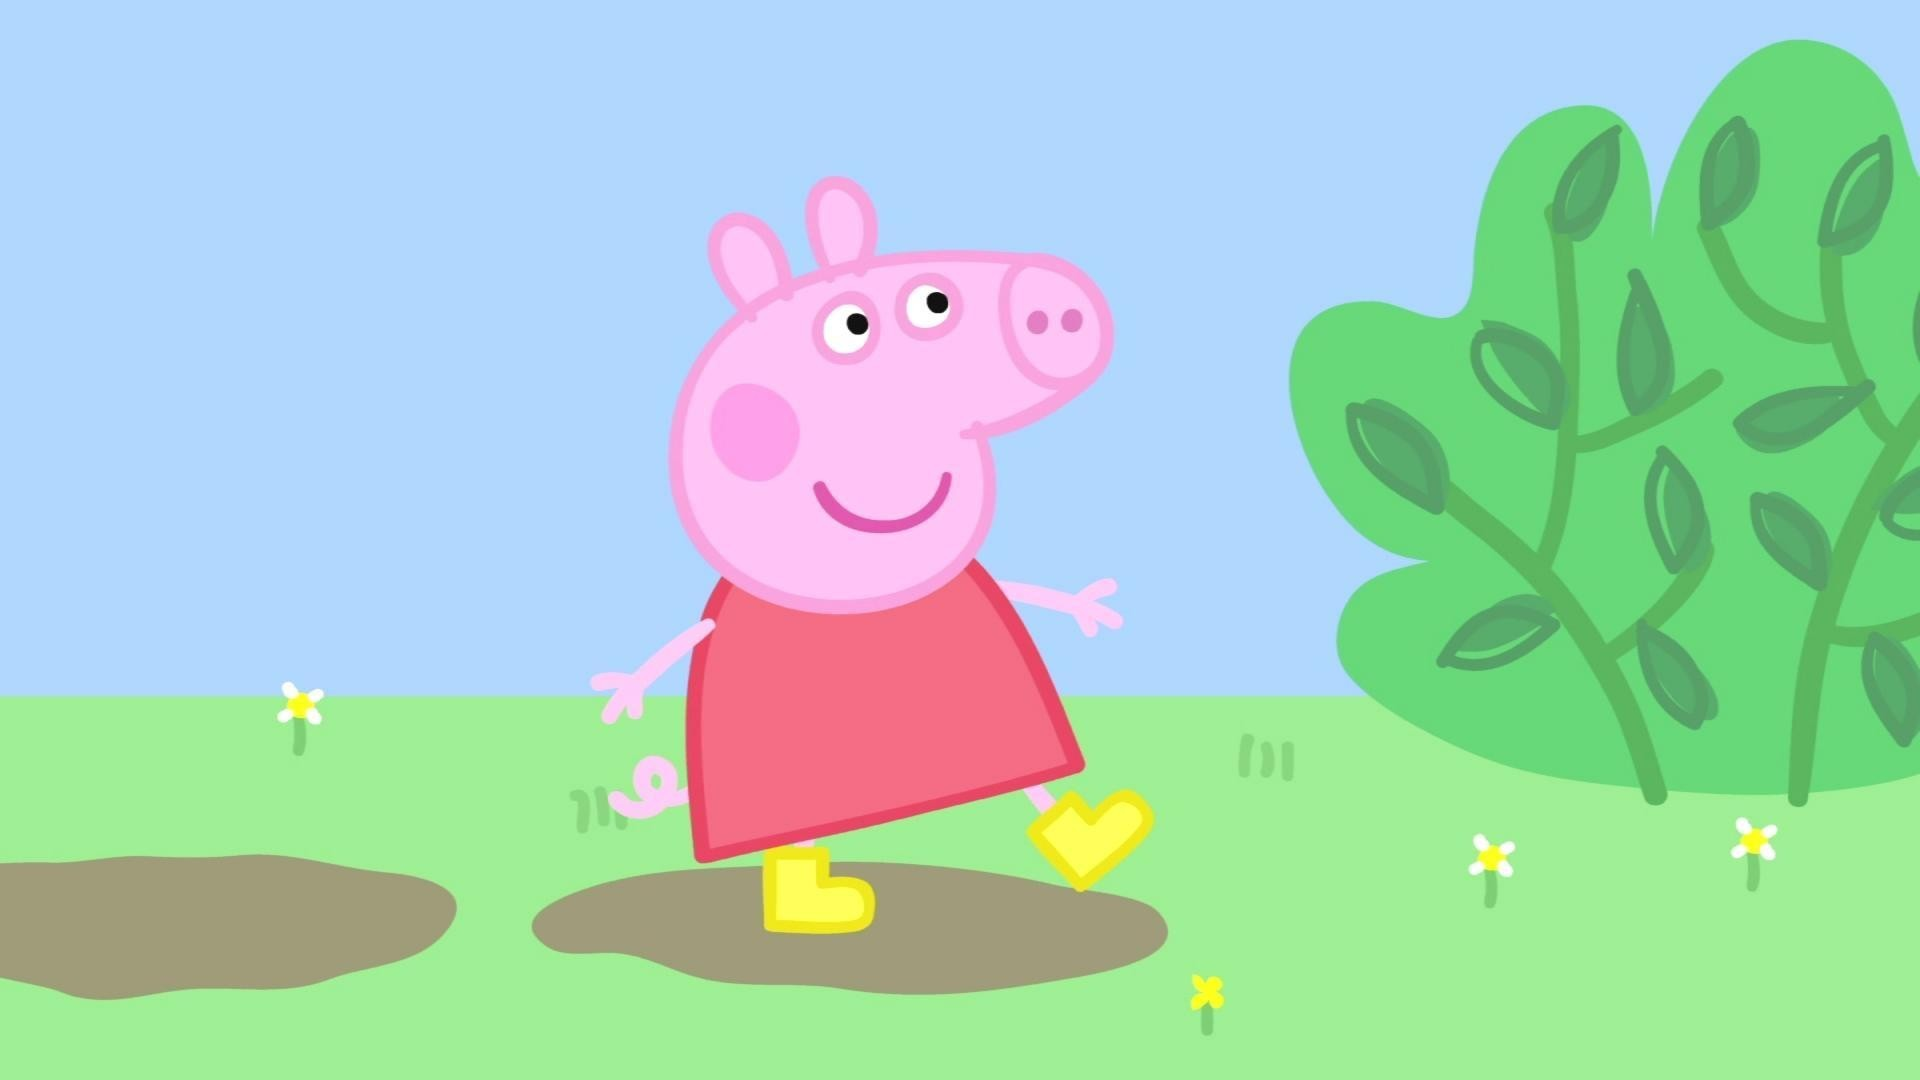 Peppa Pig HD Wallpaper 90 images